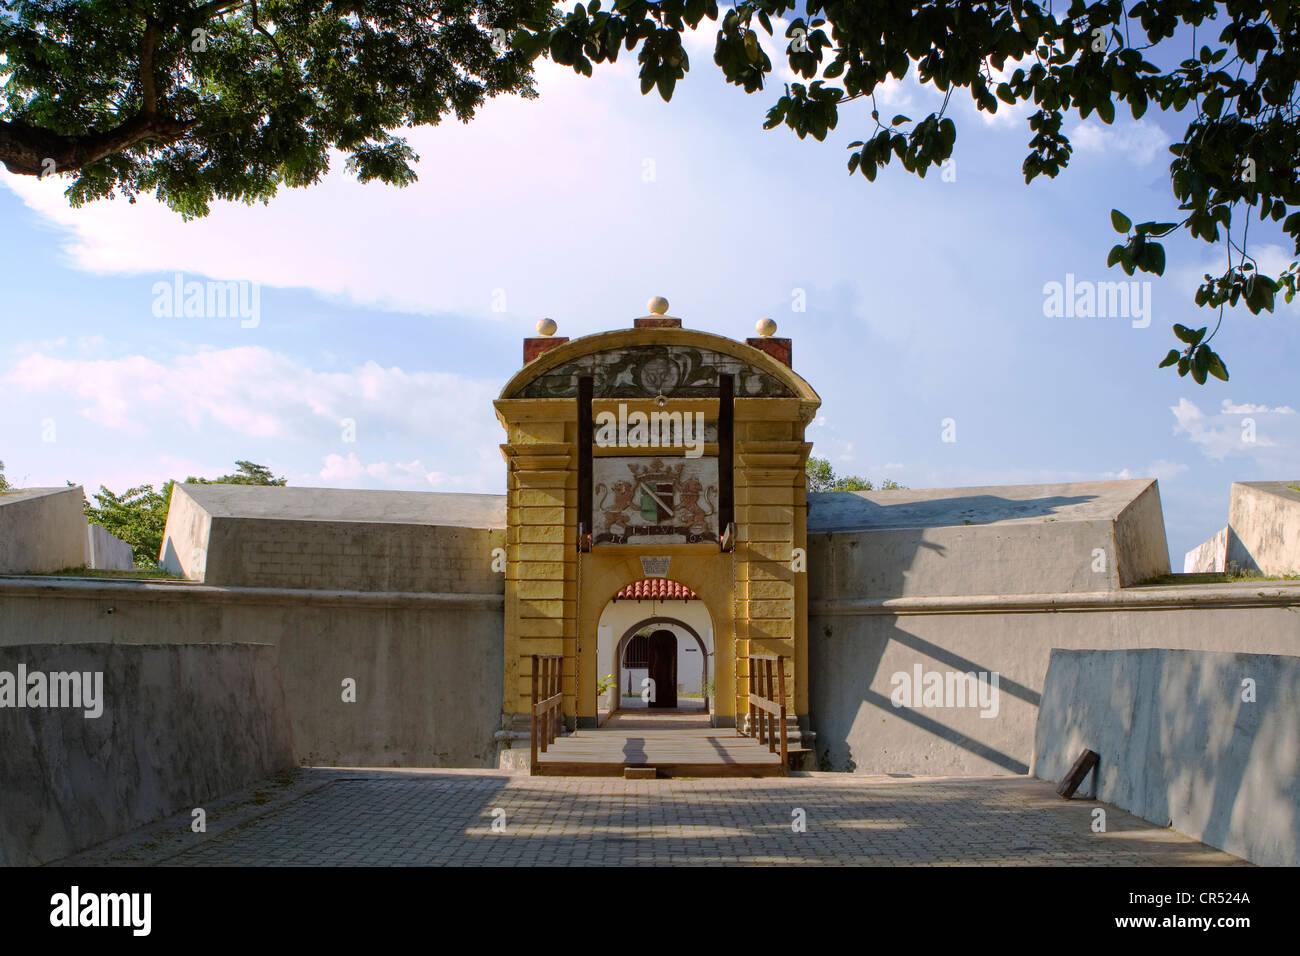 Star Fort, built by the Dutch in the 18th century, Matara, Sri Lanka - Stock Image